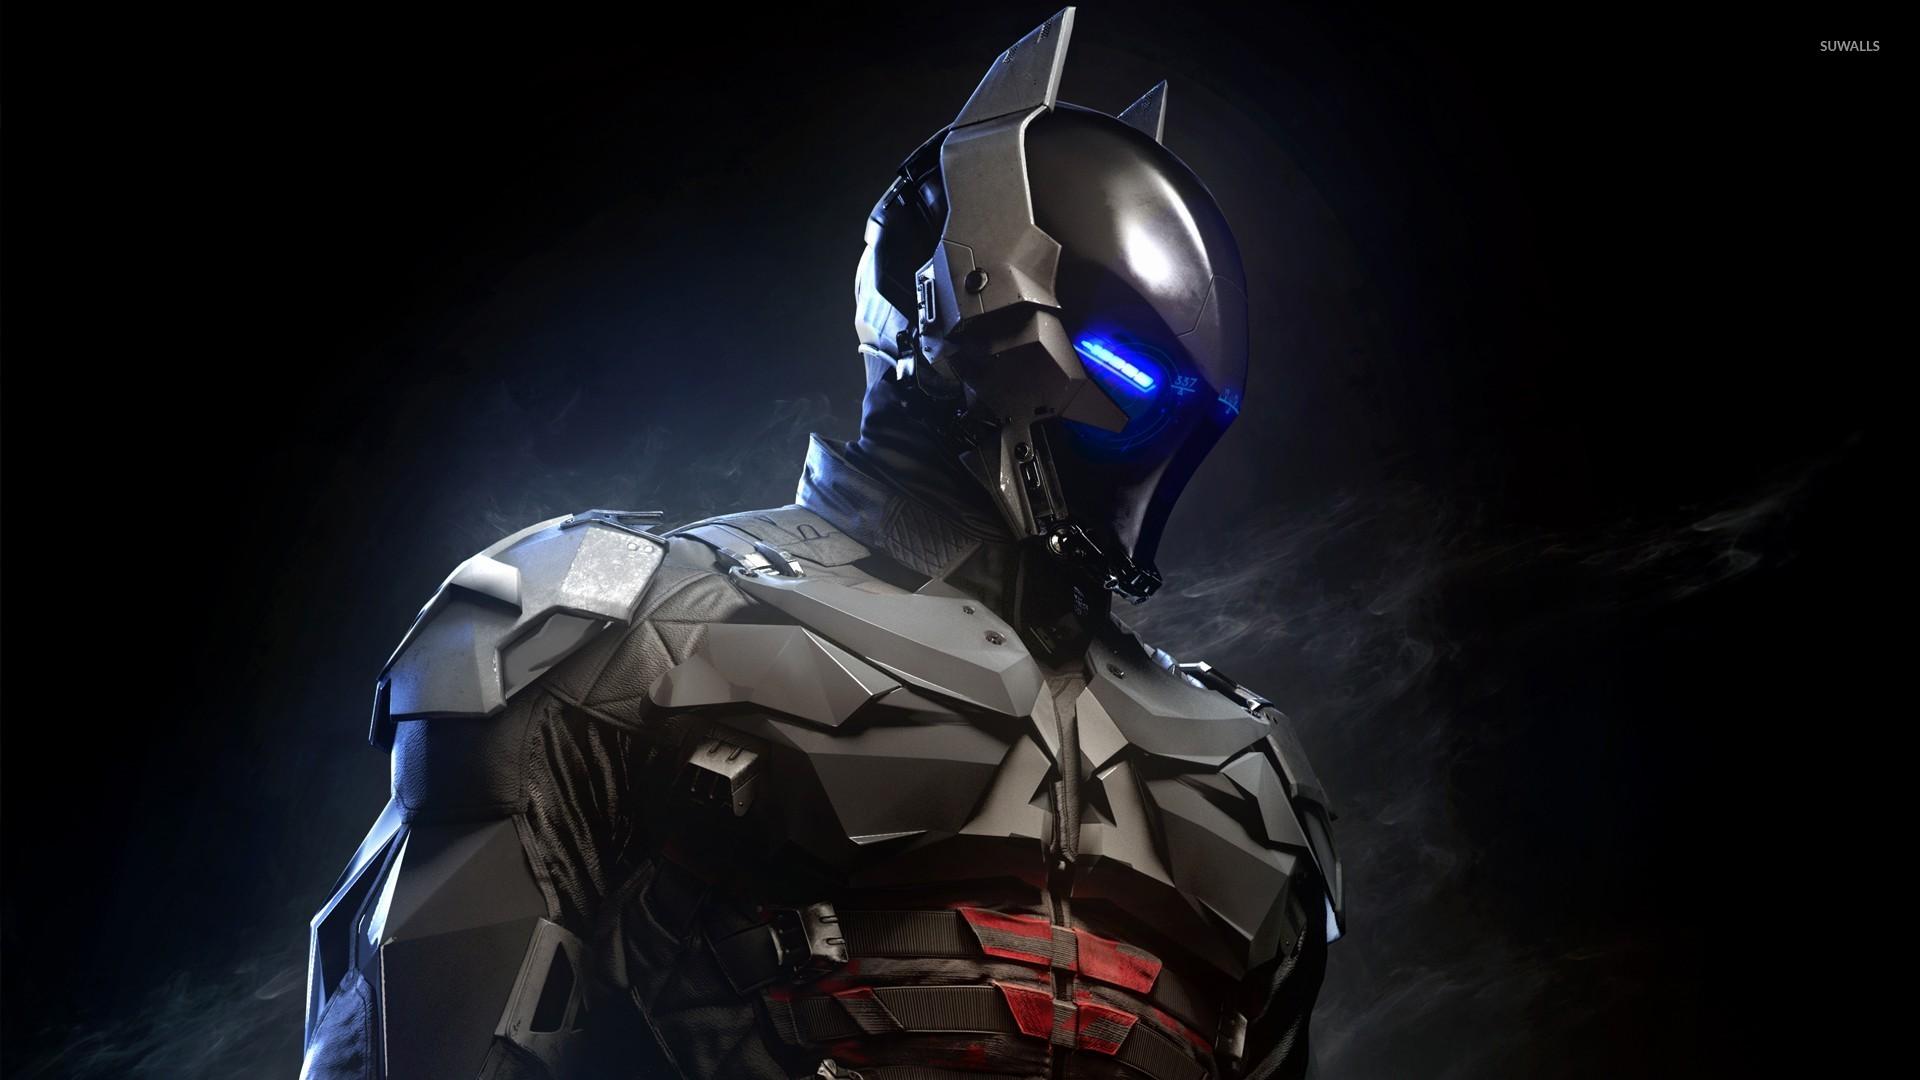 Batman Arkham Knight Wallpaper Game Wallpapers 29666